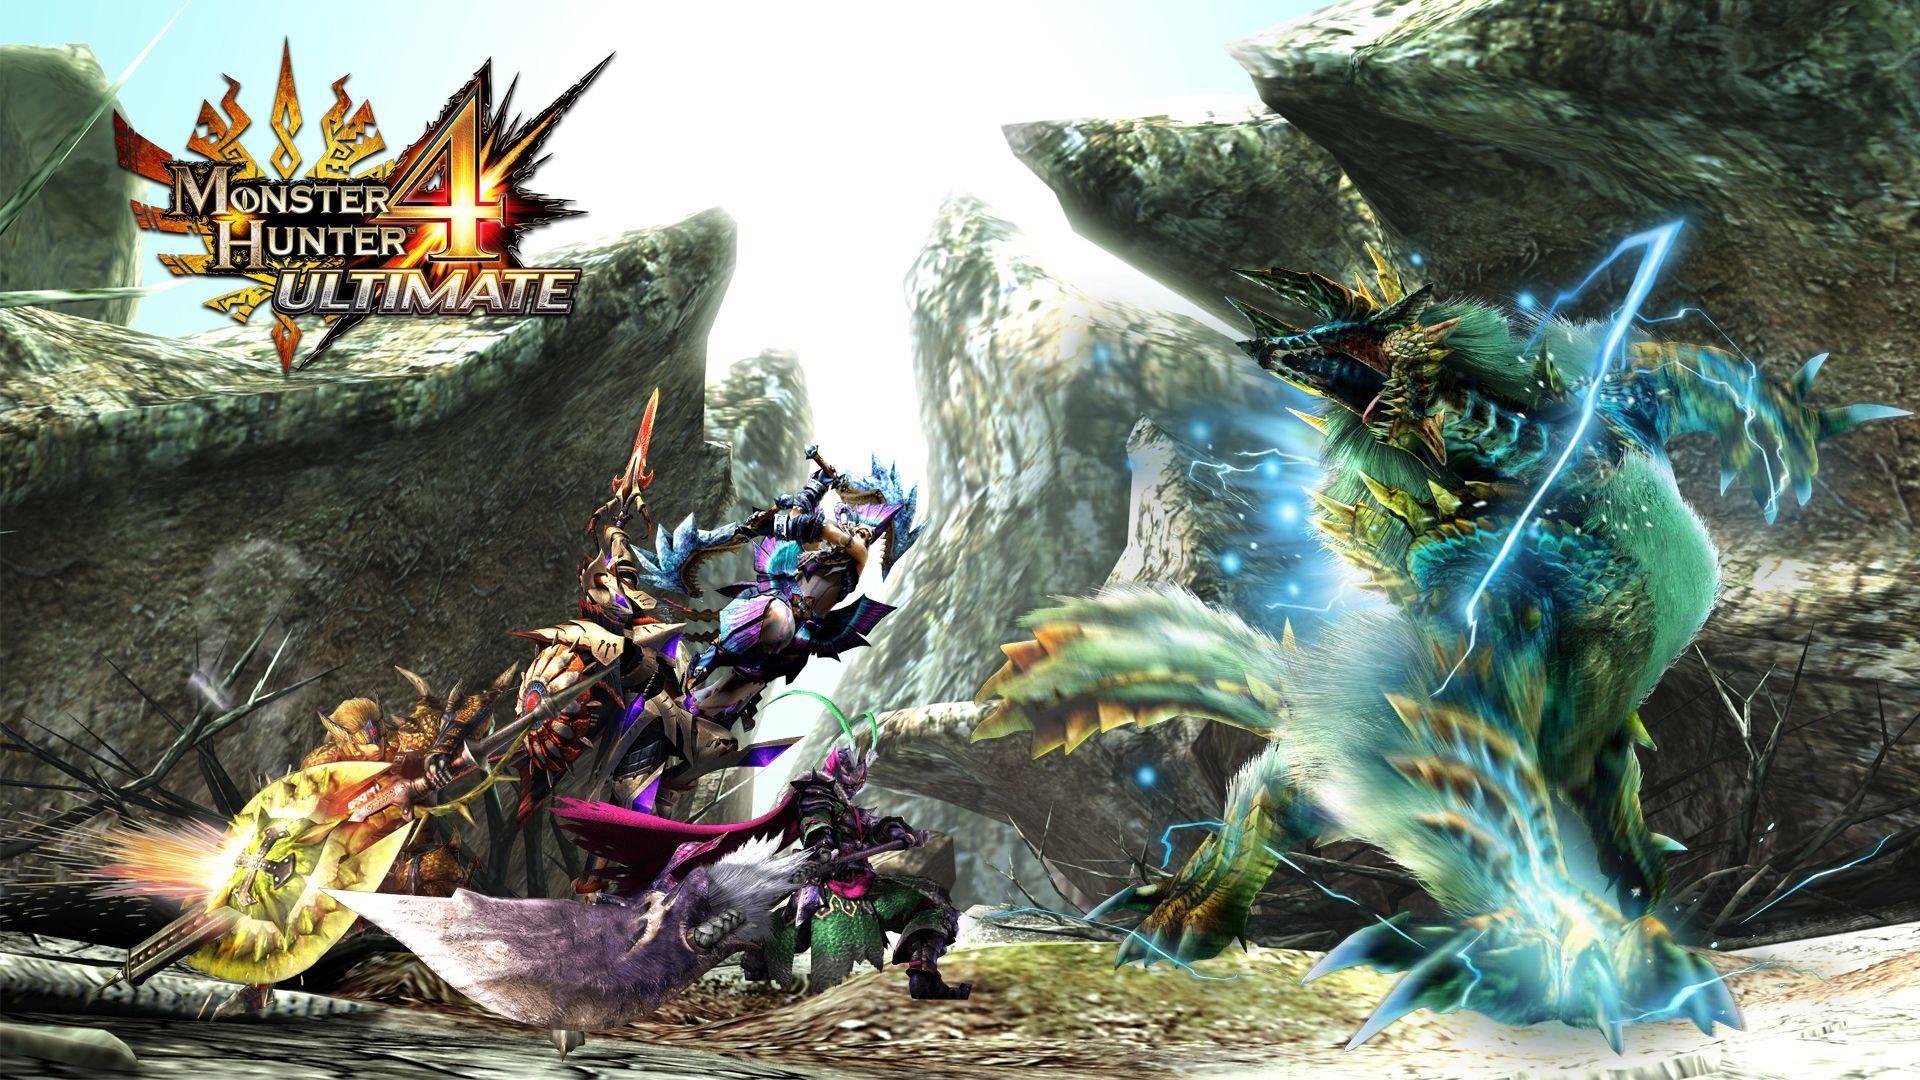 Monster Hunter Generations Ultimate Wallpapers Wallpaper Cave